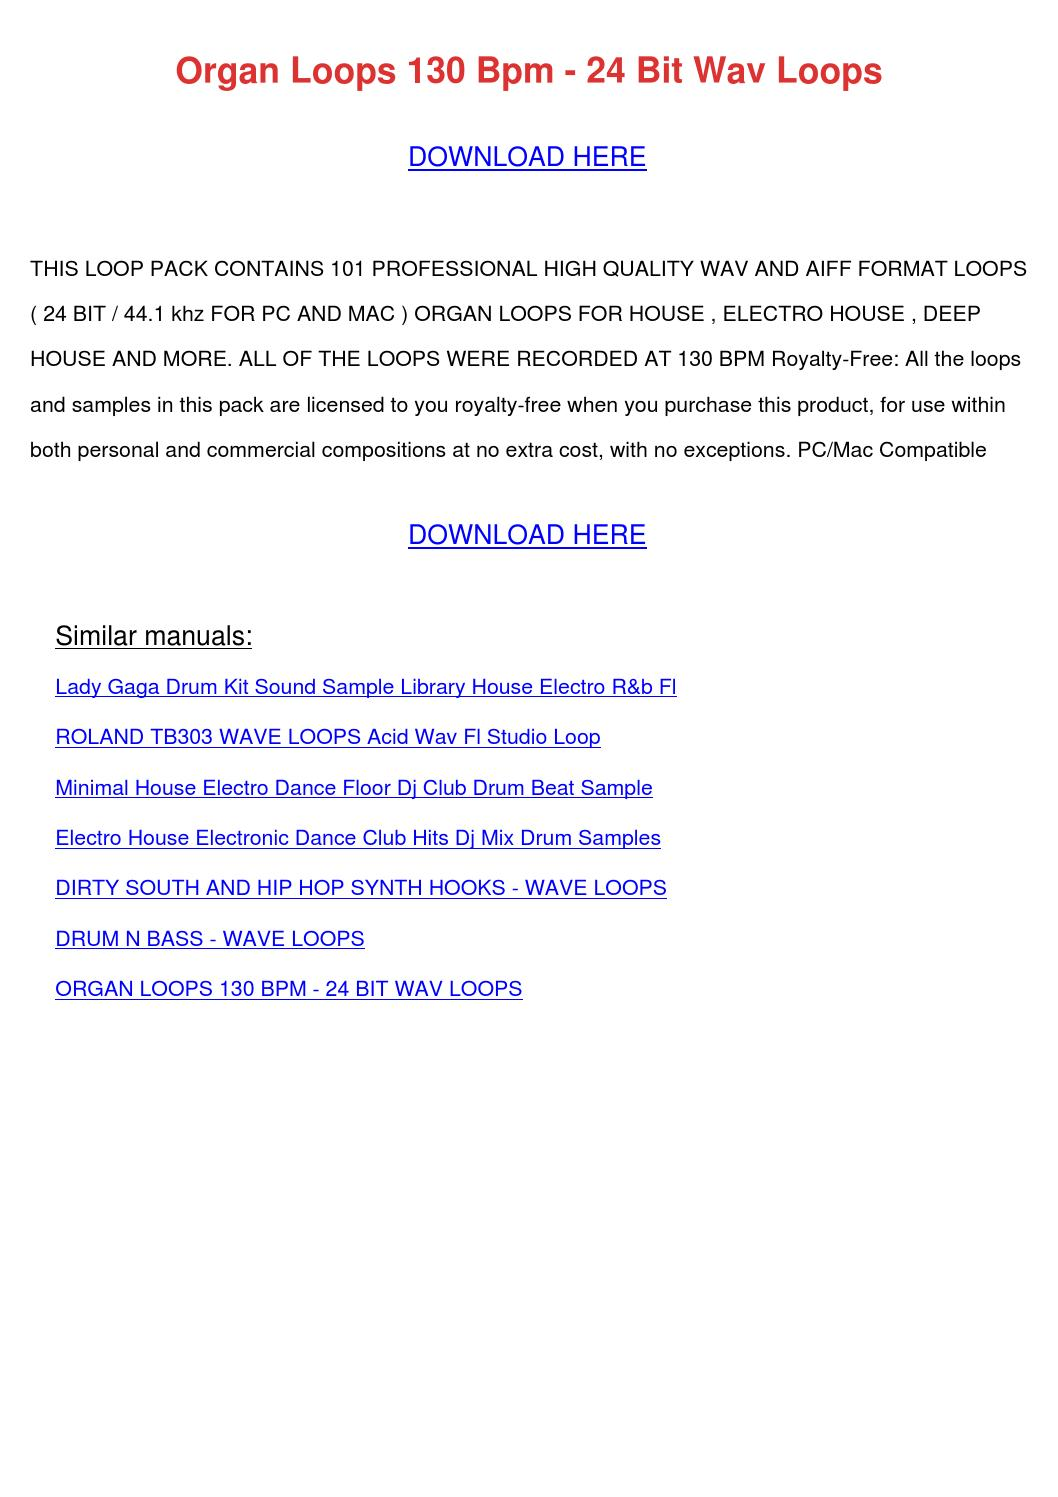 Organ Loops 130 Bpm 24 Bit Wav Loops by DoyleCrist - issuu